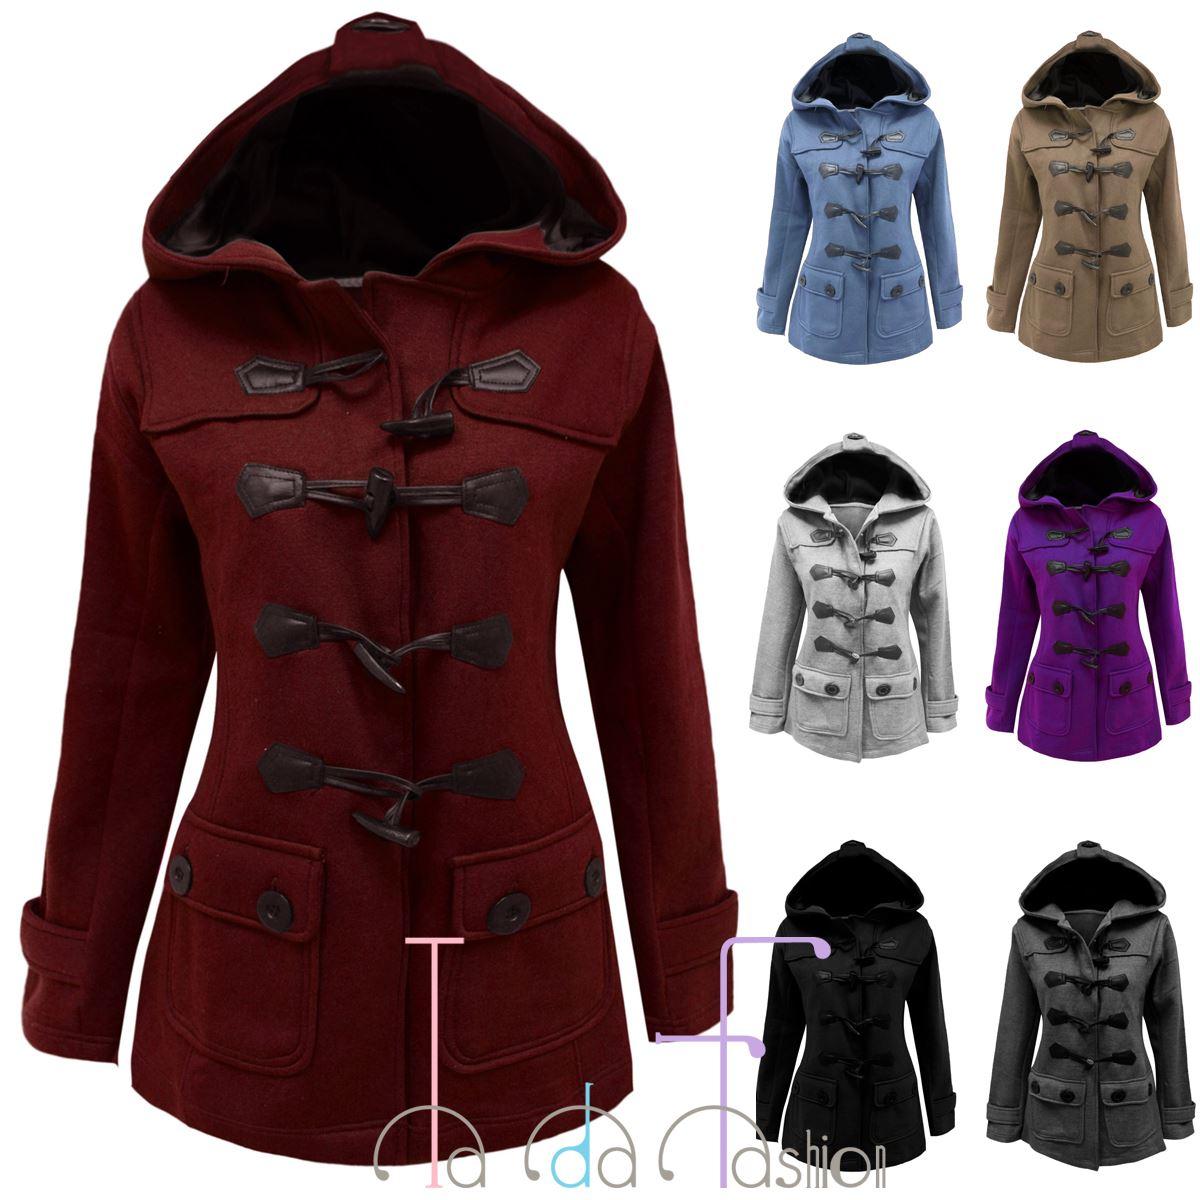 32846f33de43 TaDa Ladies Fleece Jacket Duffle Style Hooded Toggle Pocket Coat Top Plus  Size